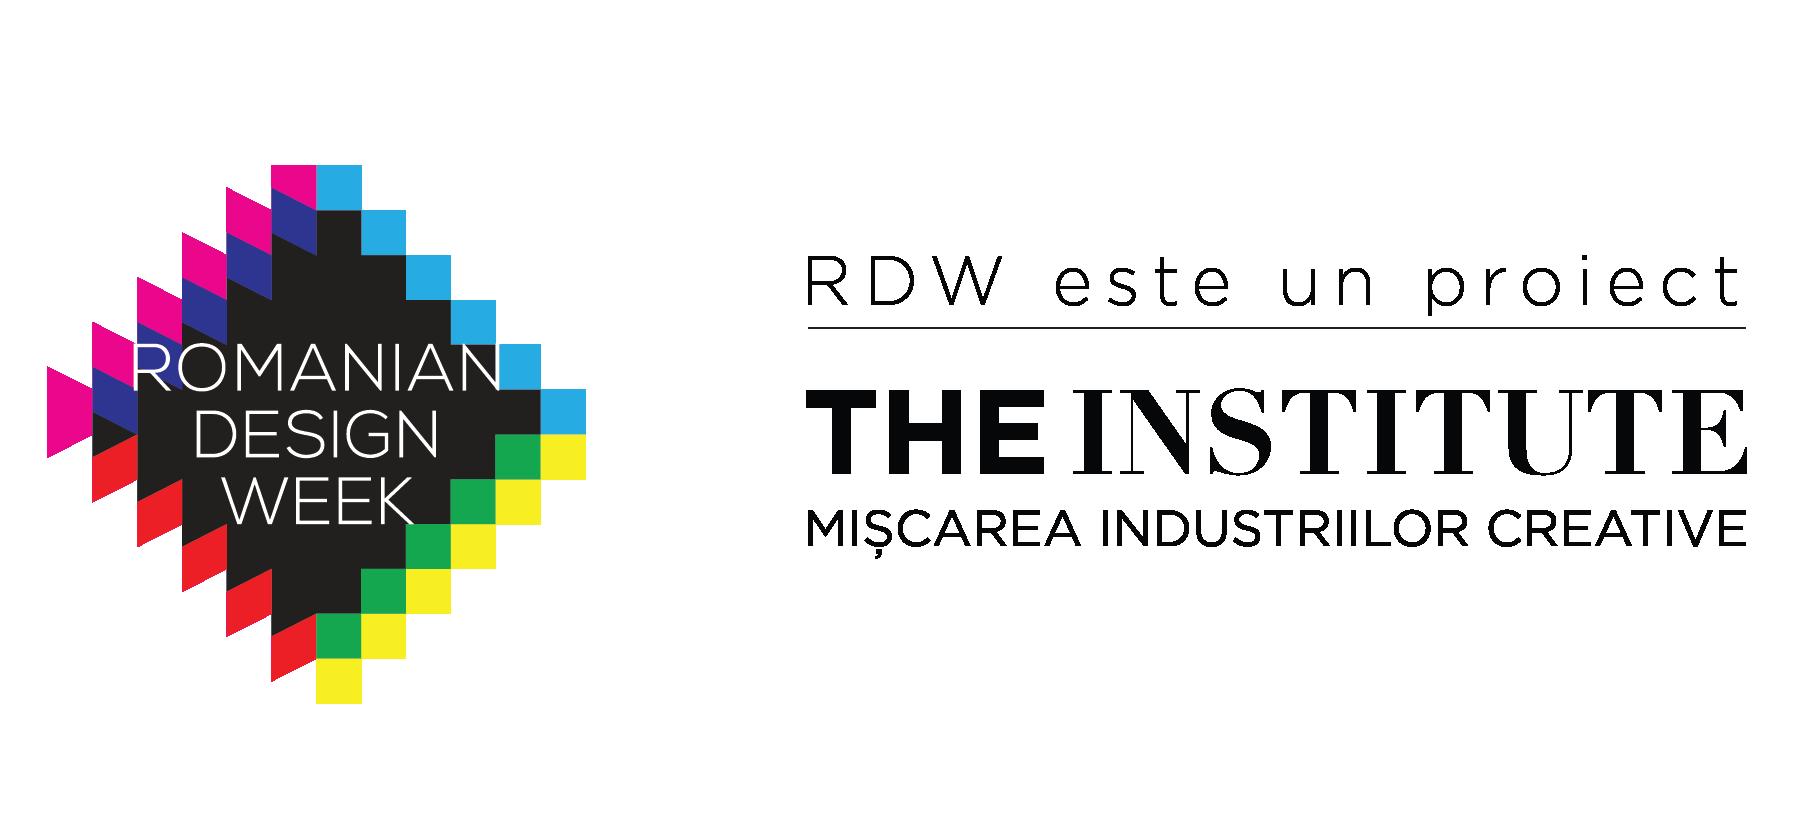 logo theinstitute_miscarea industriilor creative (1)